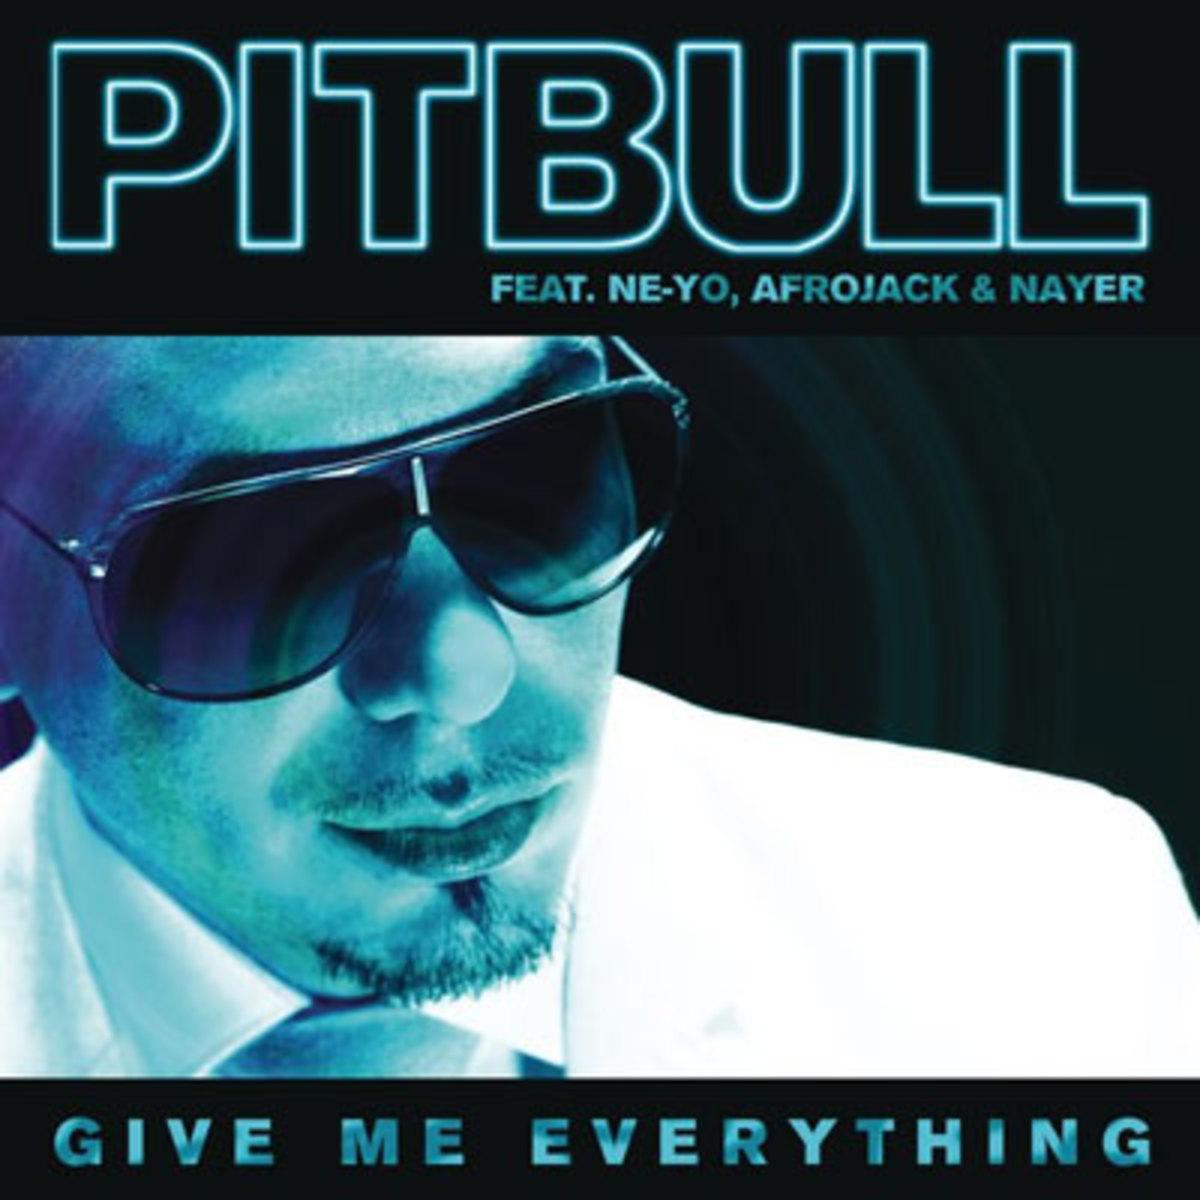 pitbull-givemeeverything.jpg